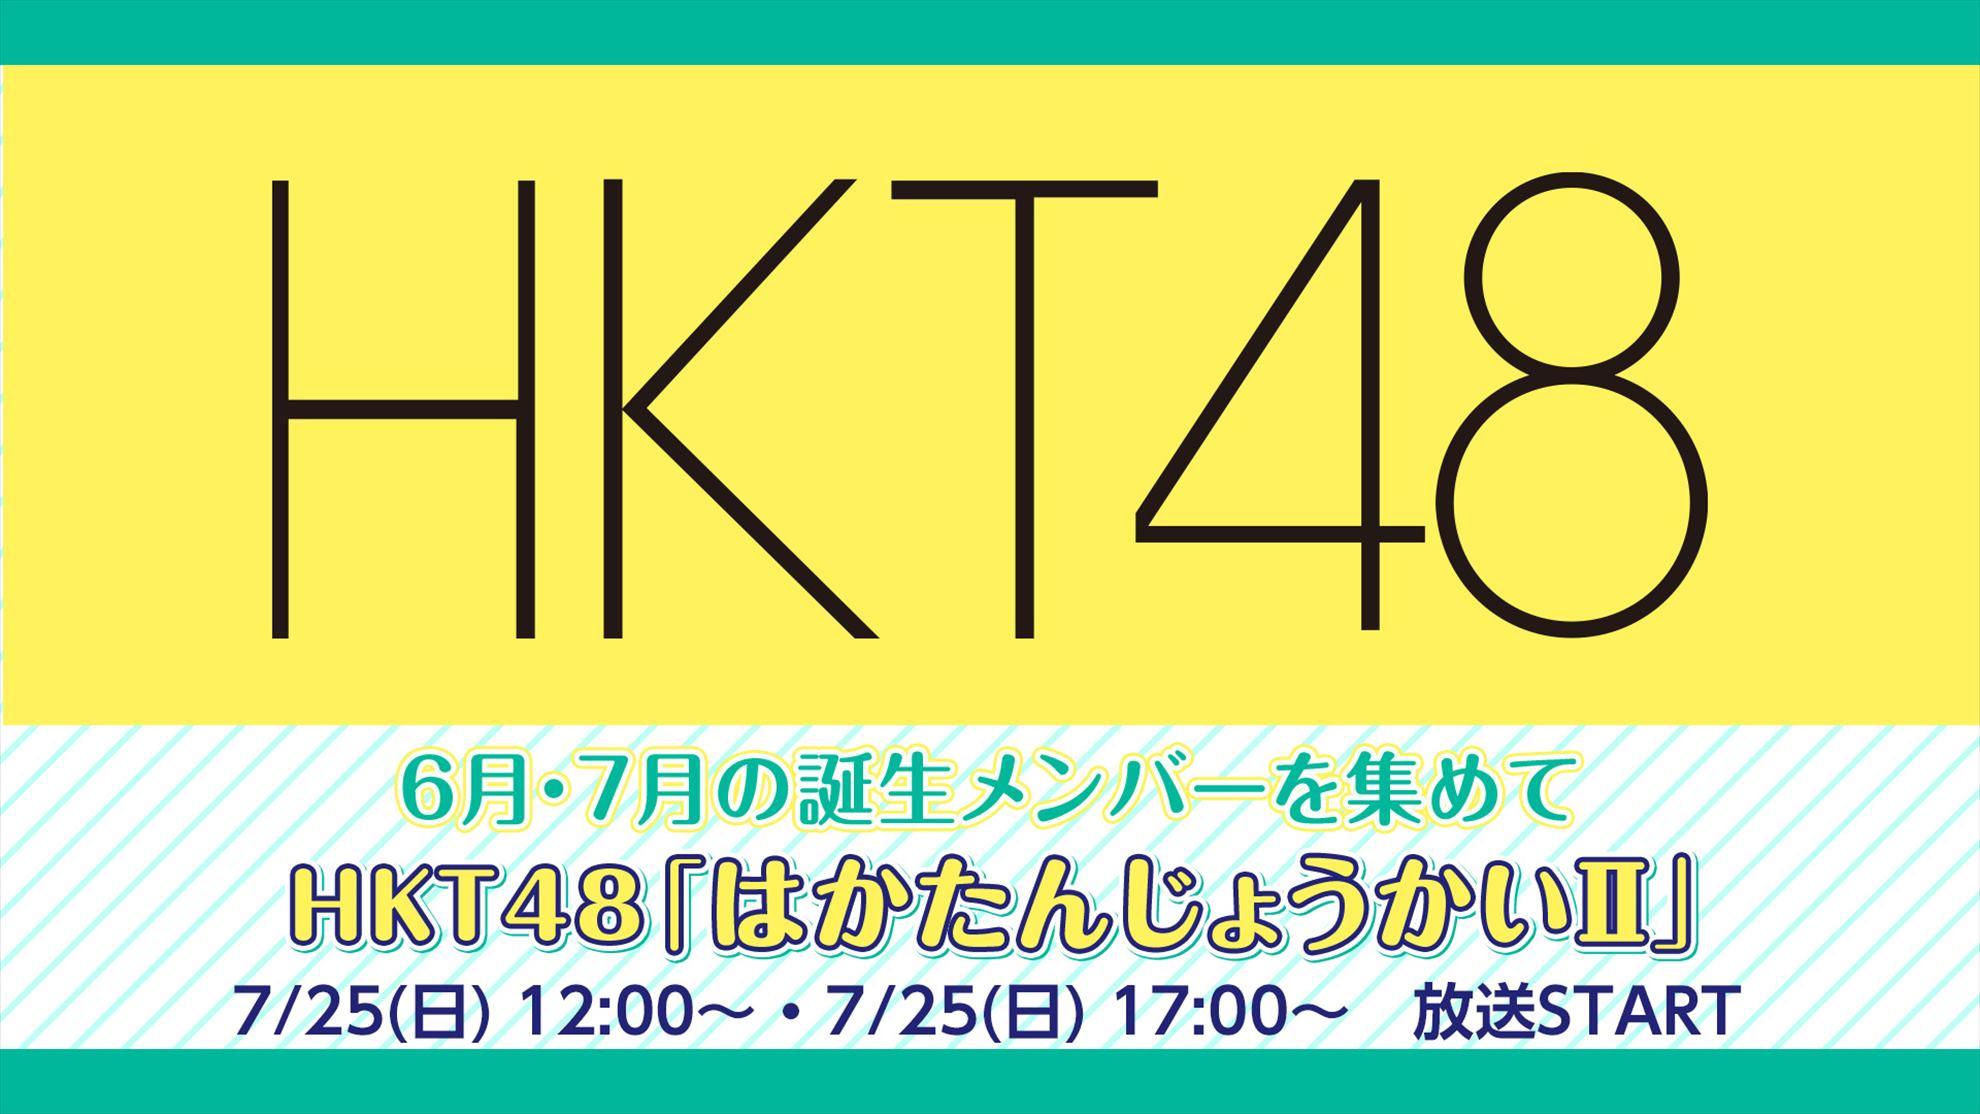 HKT48 6月誕生メンバー生出演「はかたんじょうかいⅡ」動画 2021年7月25日